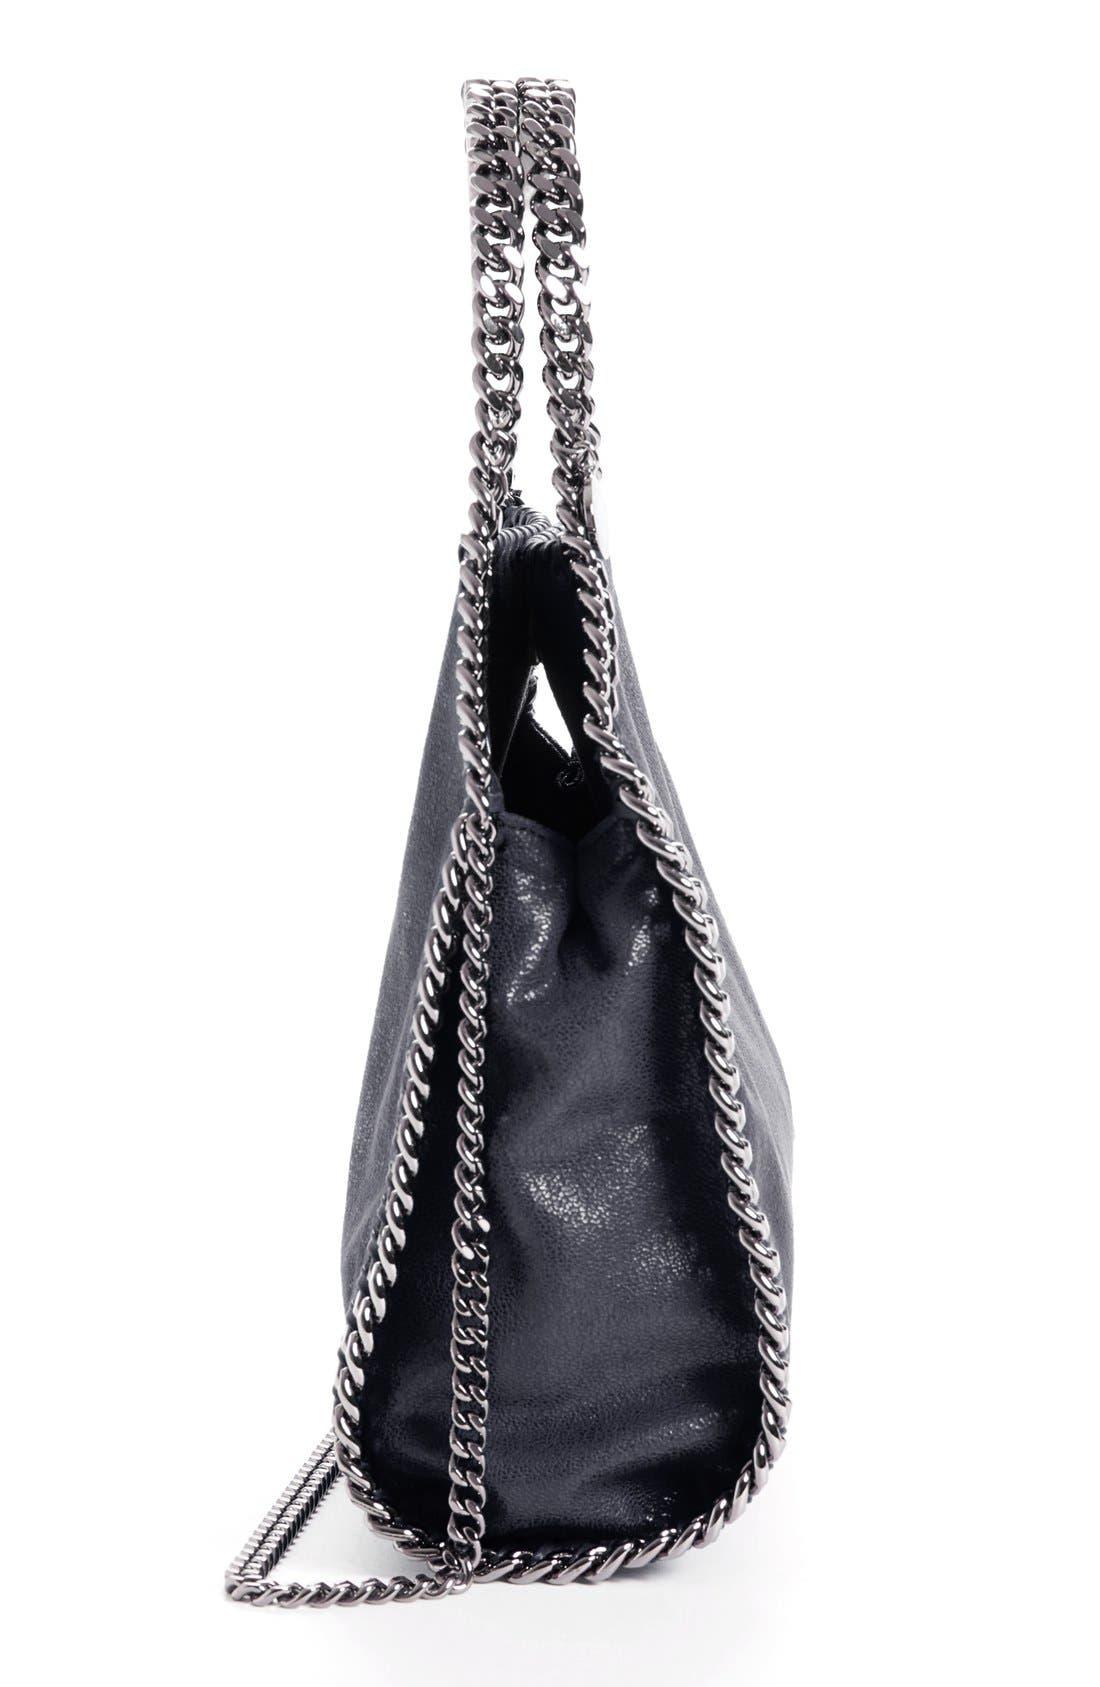 'Mini Falabella - Shaggy Deer' Faux Leather Tote,                             Alternate thumbnail 7, color,                             BLACK W/ SILVER